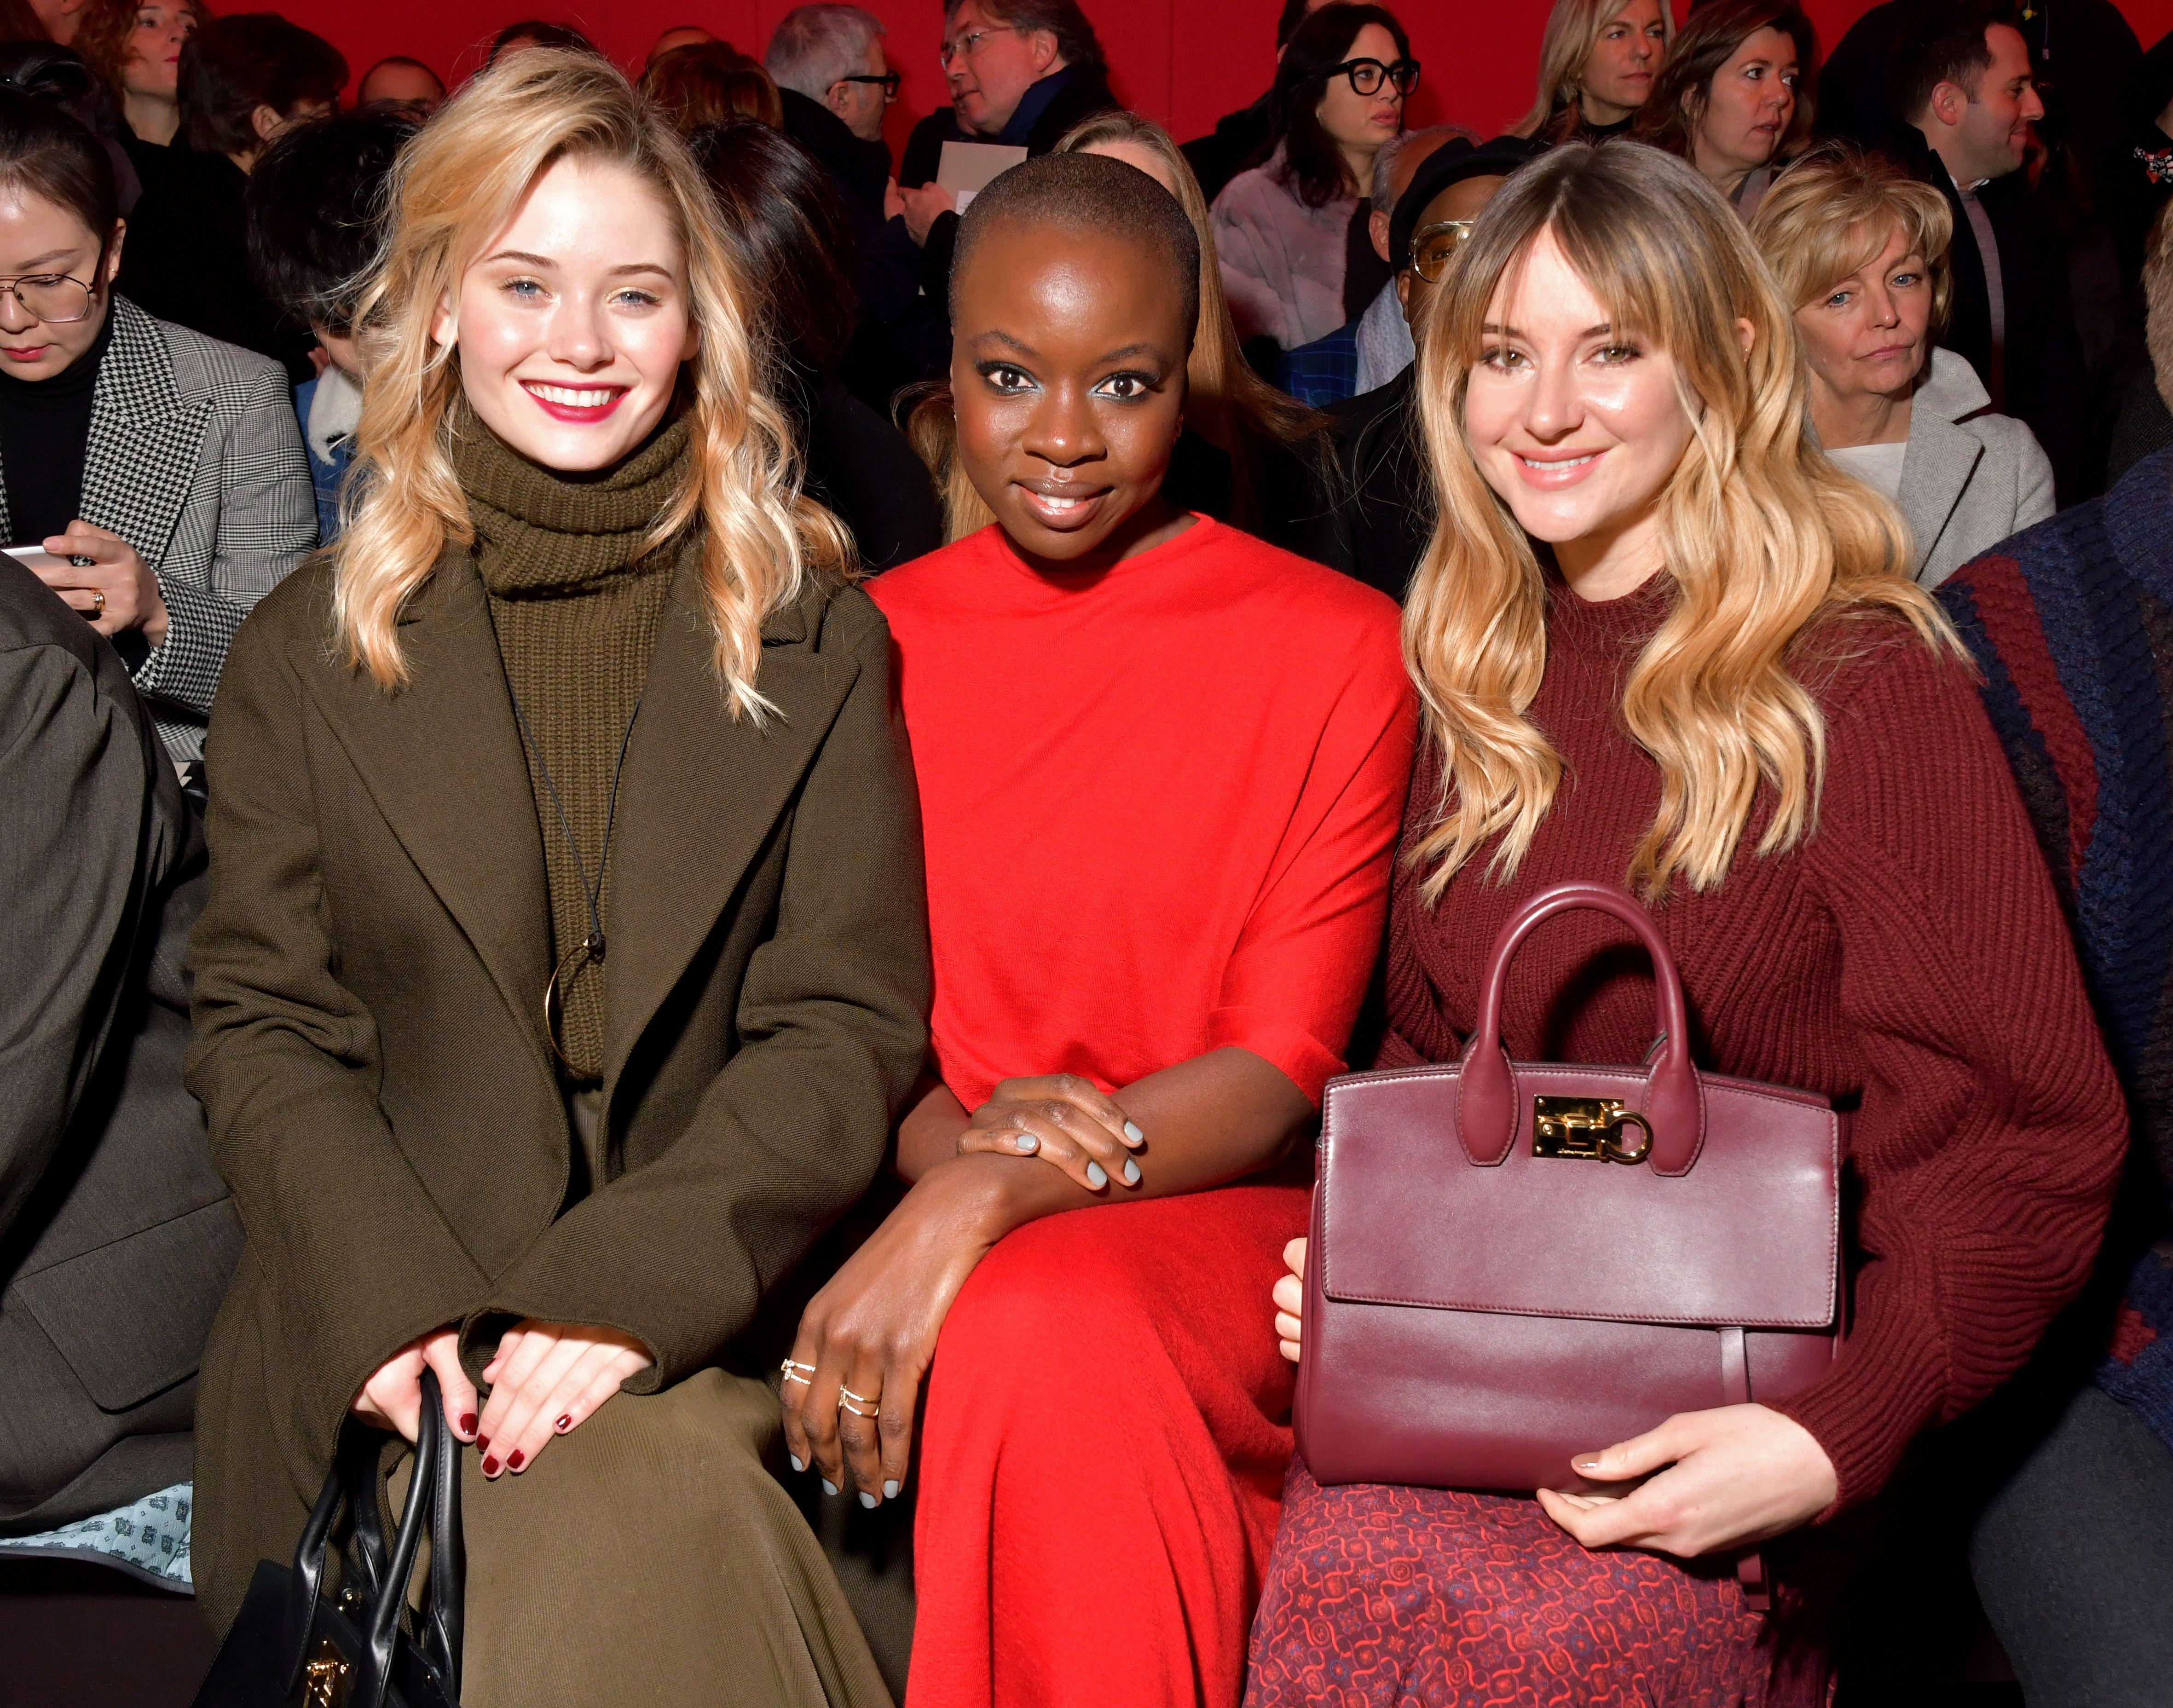 Virginia Gardner, Danai Gurira and Shailene WoodleySalvatore Ferragamo show, Front Row, Fall Winter 2018, Milan Fashion Week, Italy - 24 Feb 2018